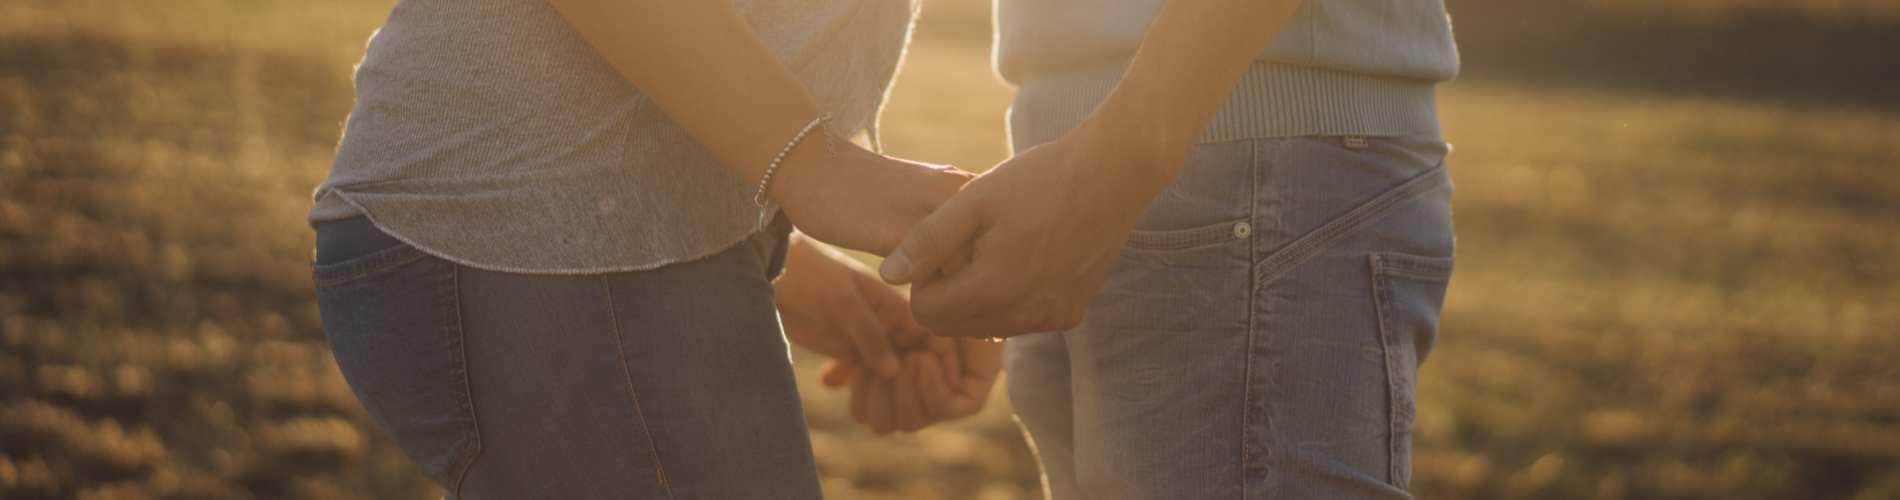 patients holding hand rmanj